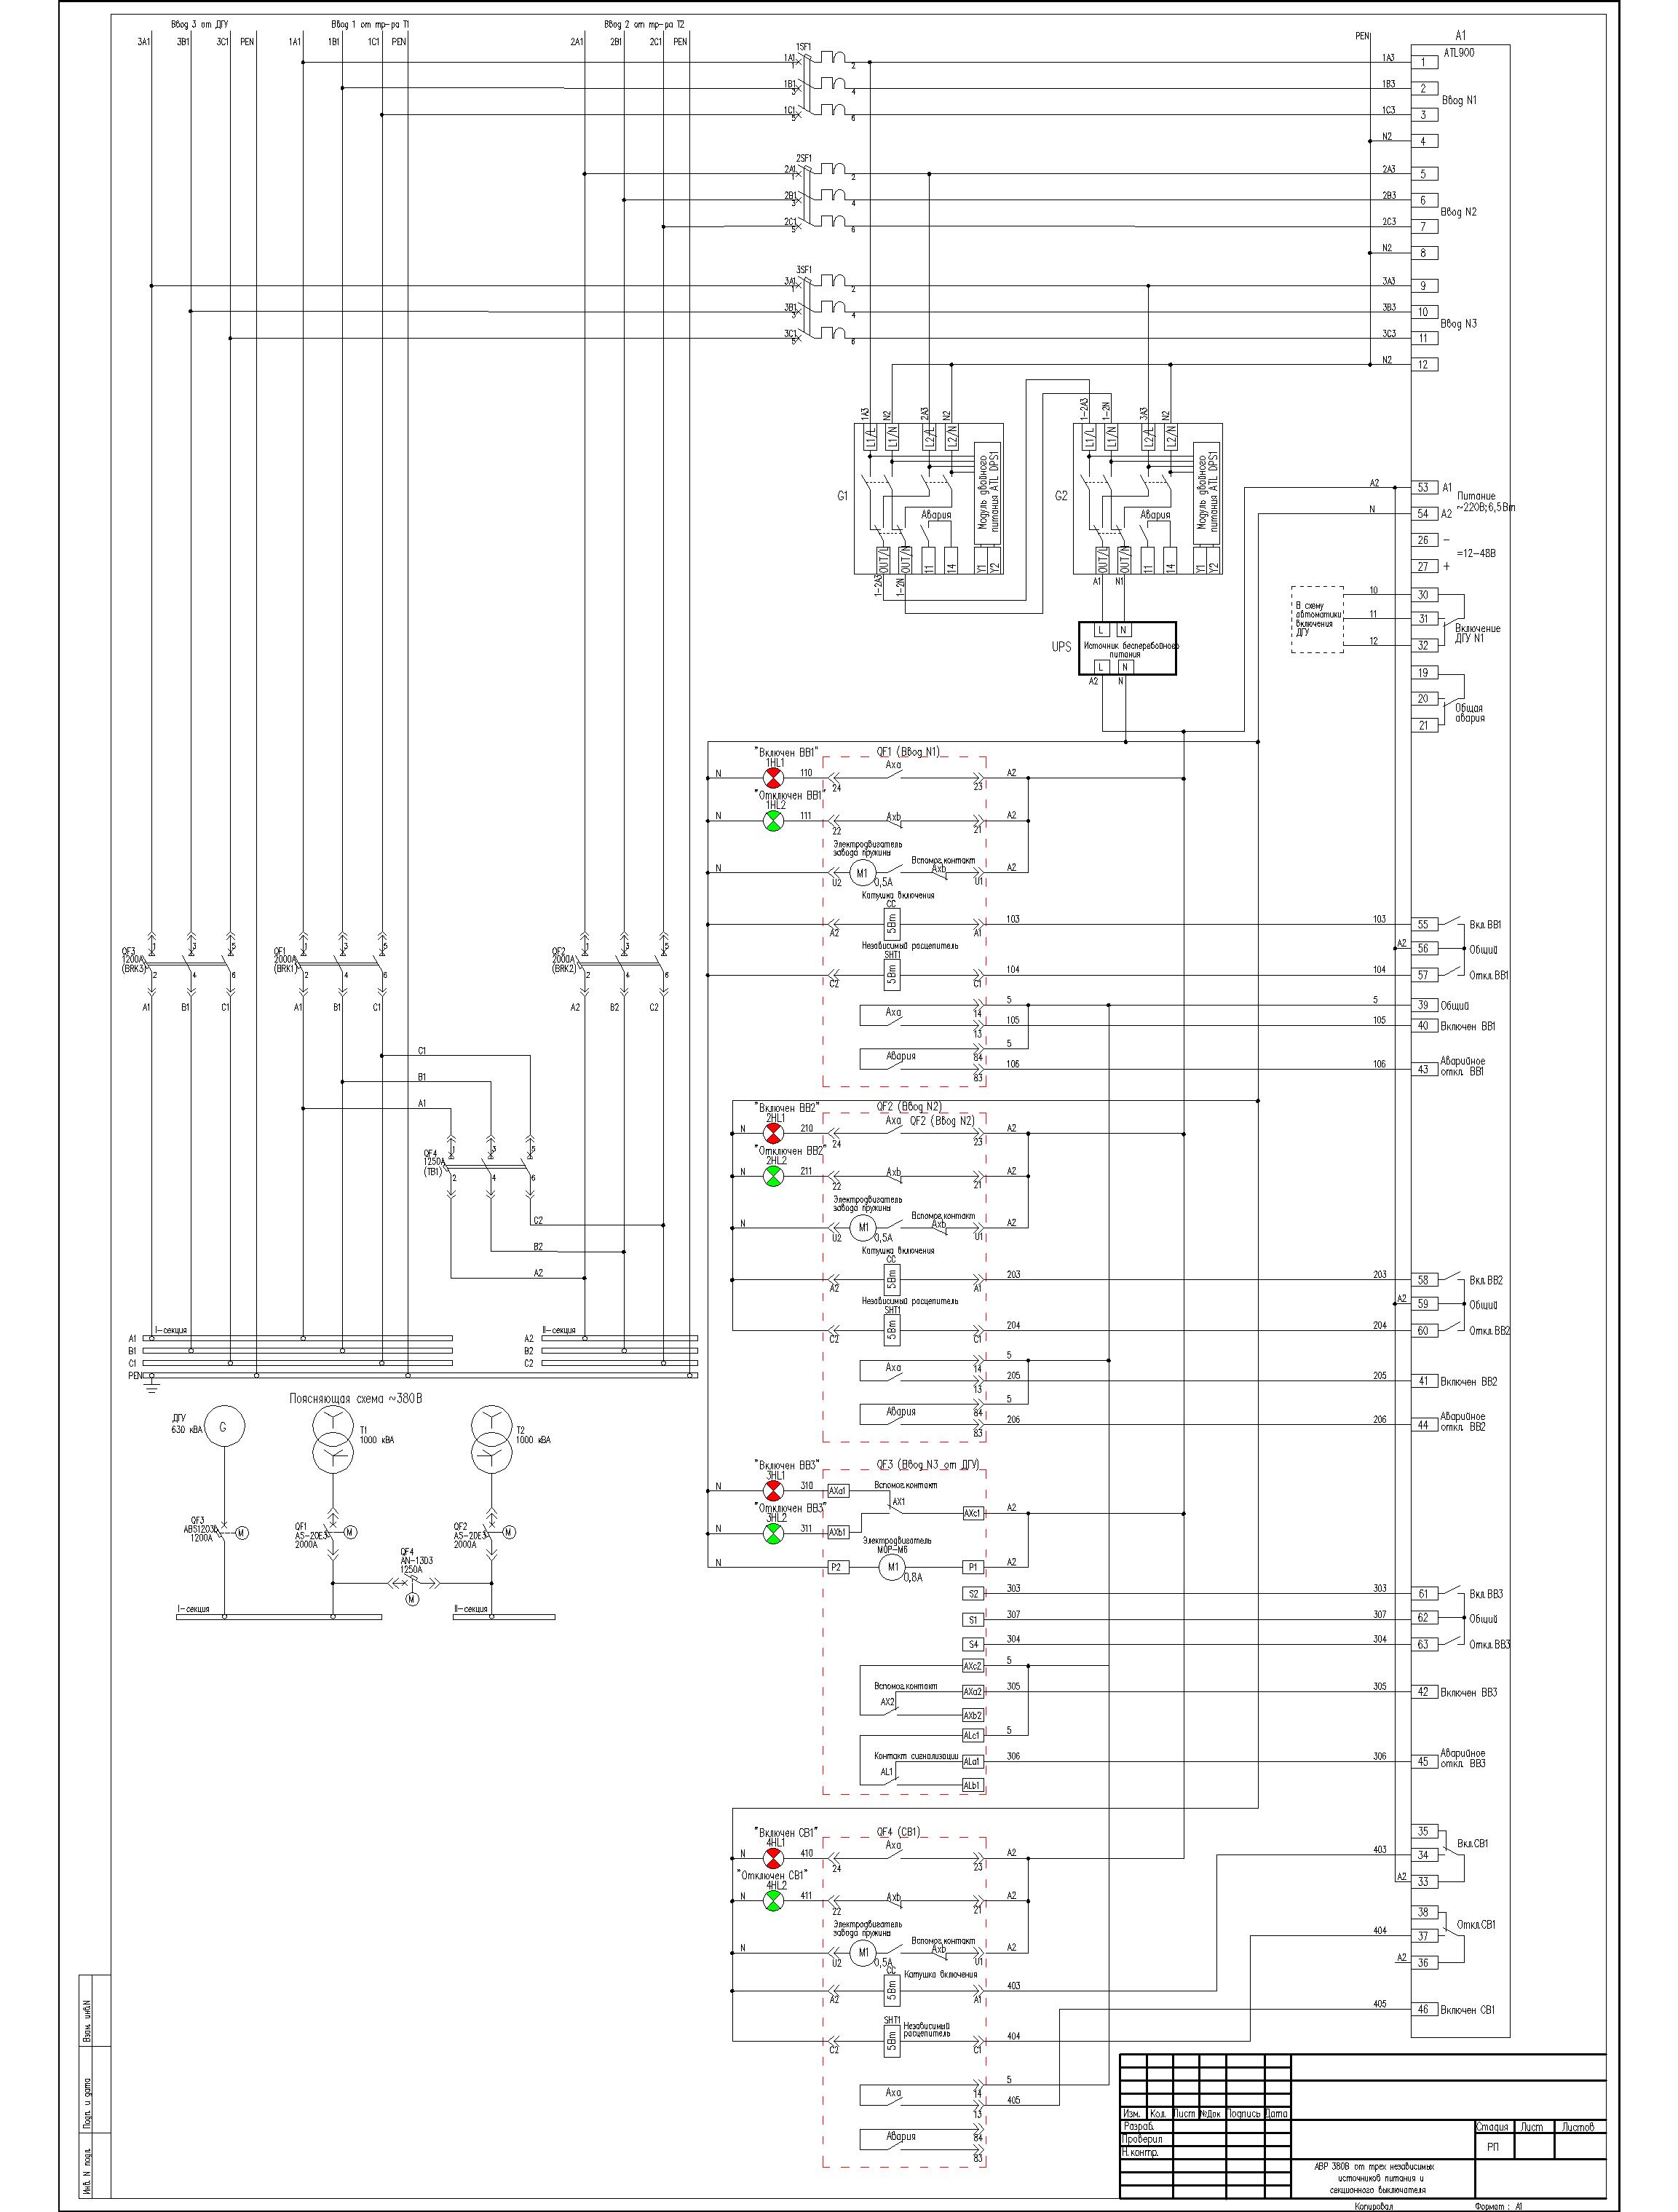 Схема АВР на контроллере ATL900 в формате dwg